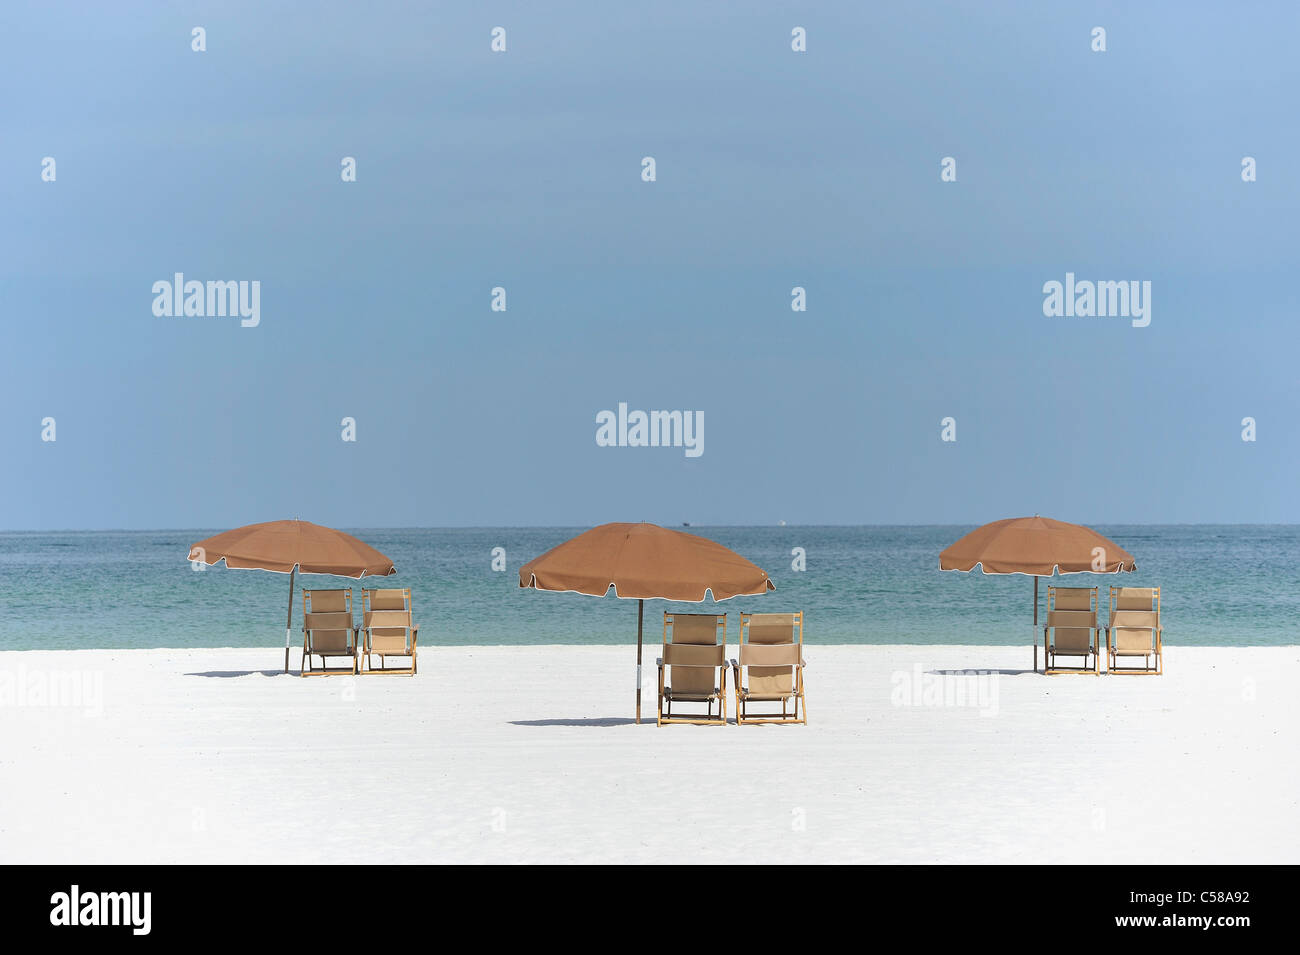 Strand, Stühle, Sonnenschirme, weiß, Sand, Strand, Golf, Meer, Clearwater Beach, Florida, USA, Mexiko, Stockbild